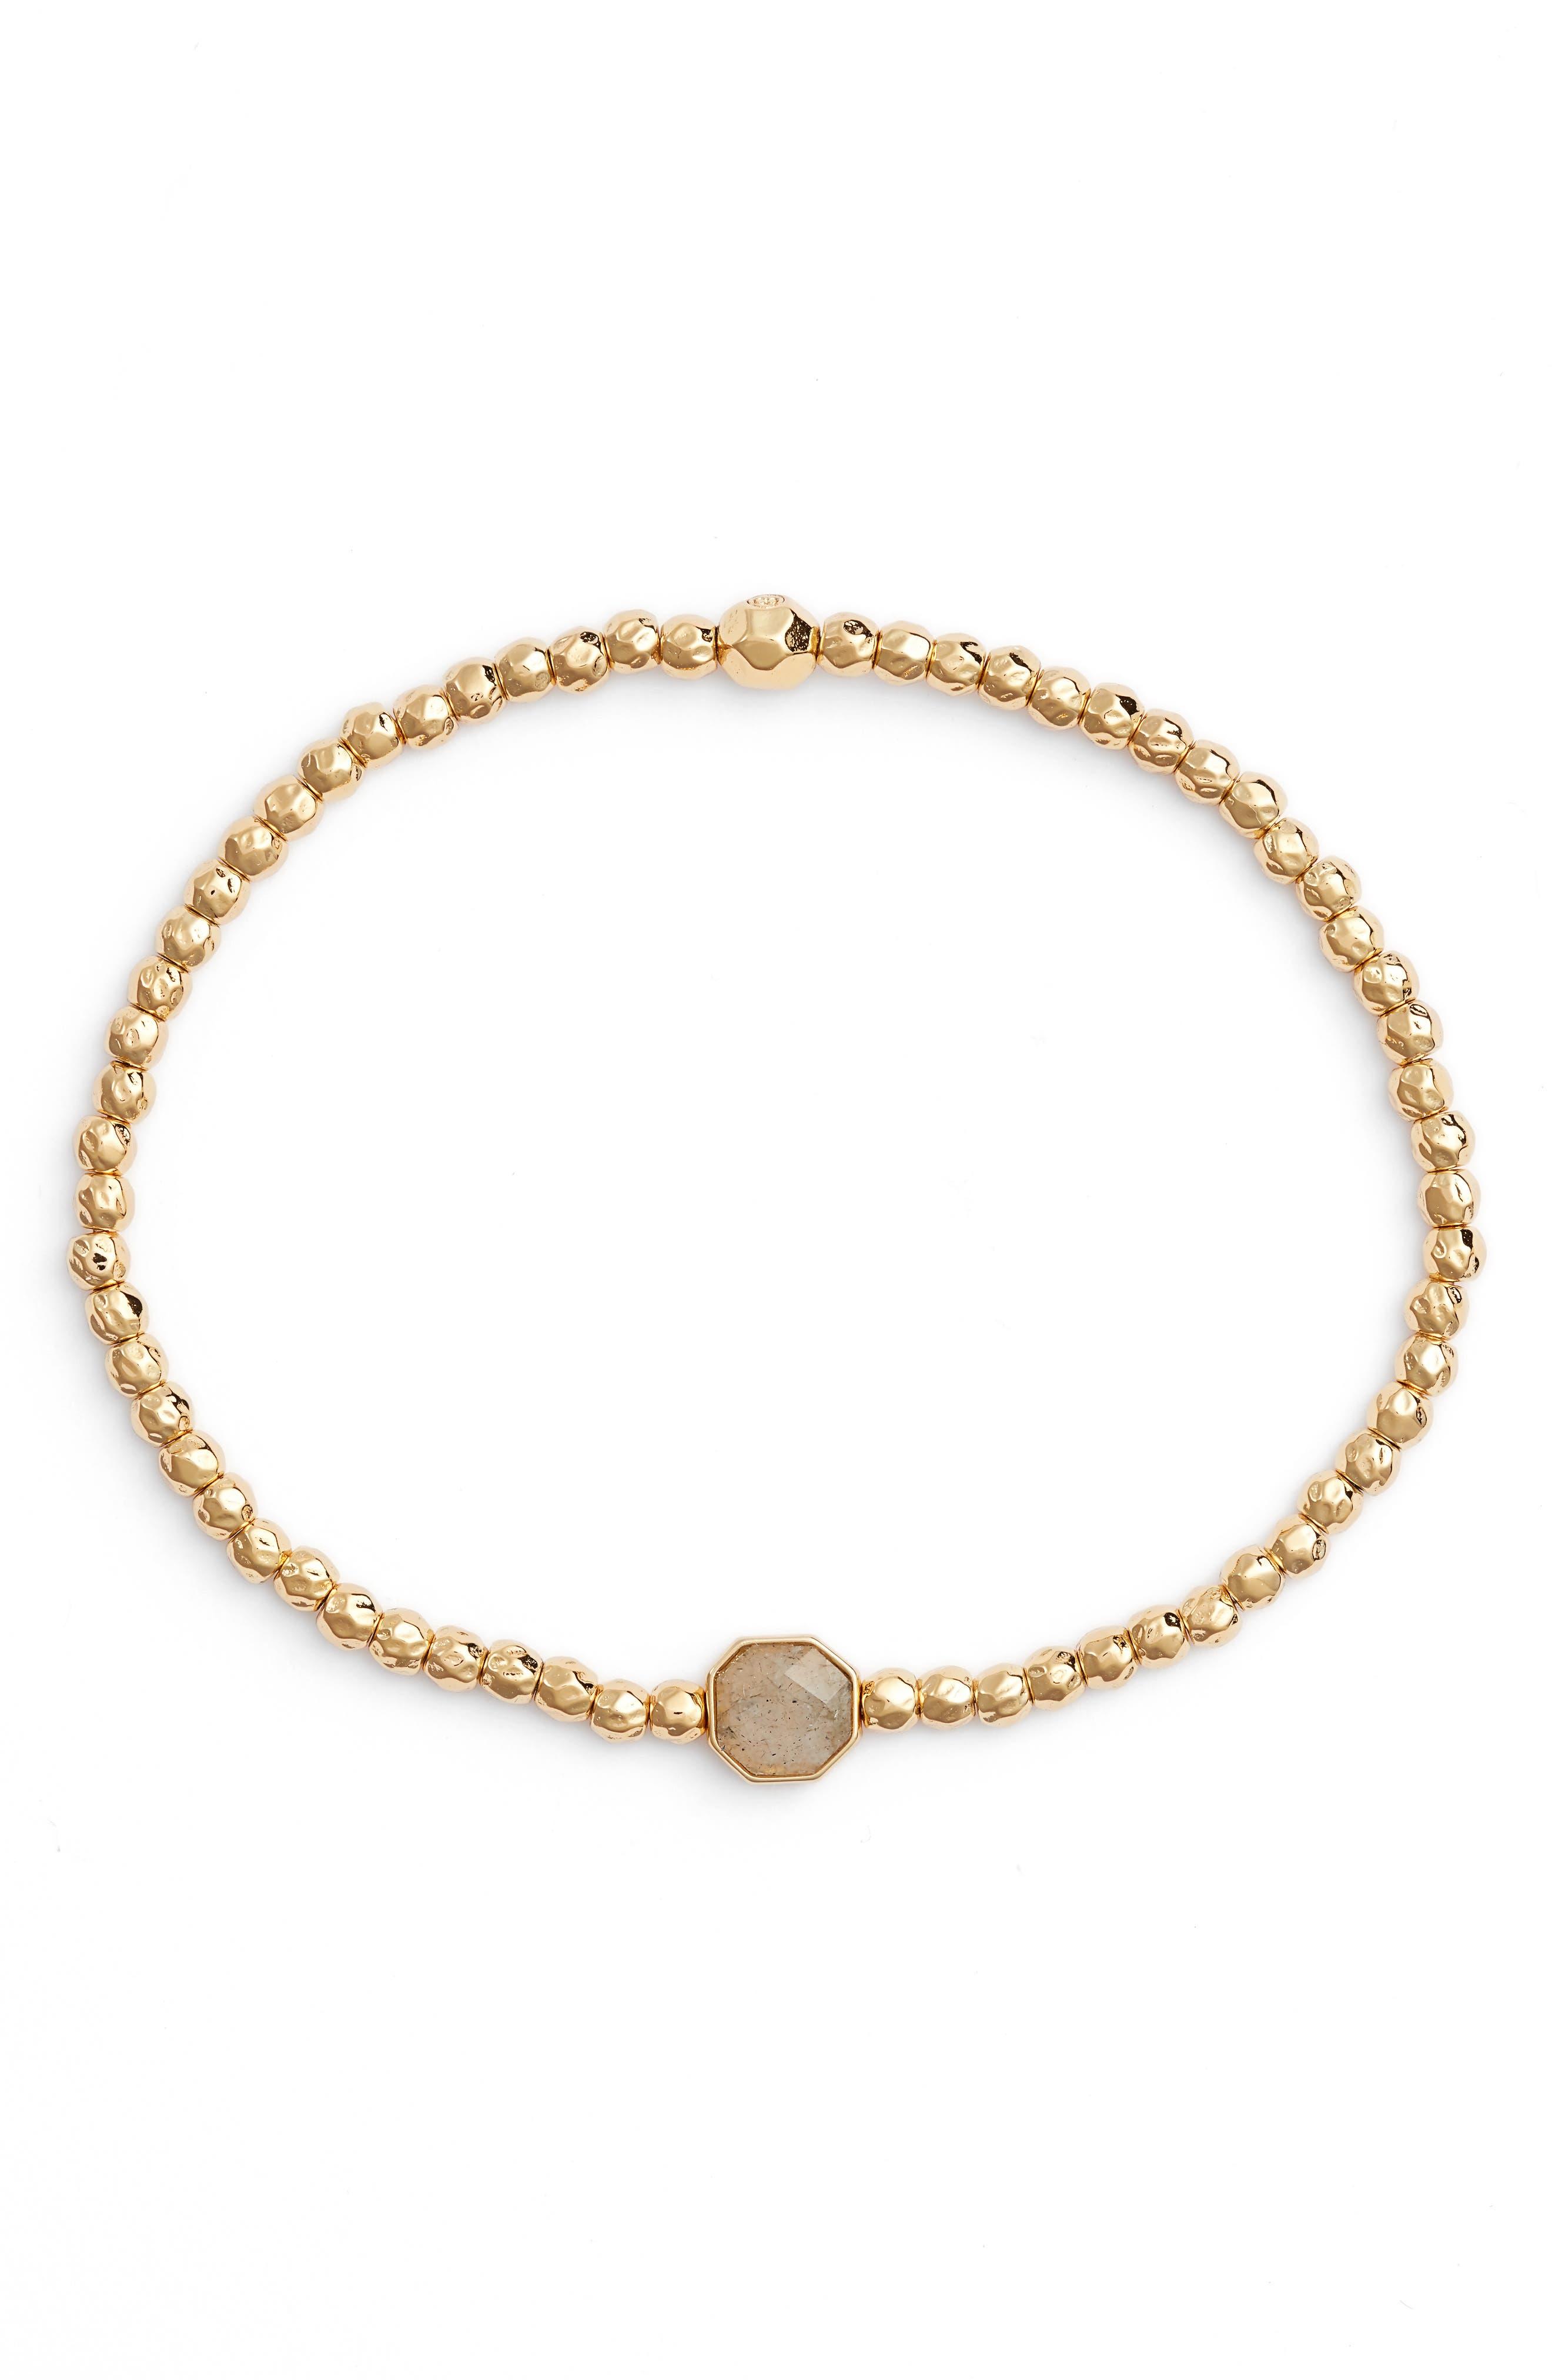 Power Gemstone Beaded Bracelet in Labradorite/ Gold